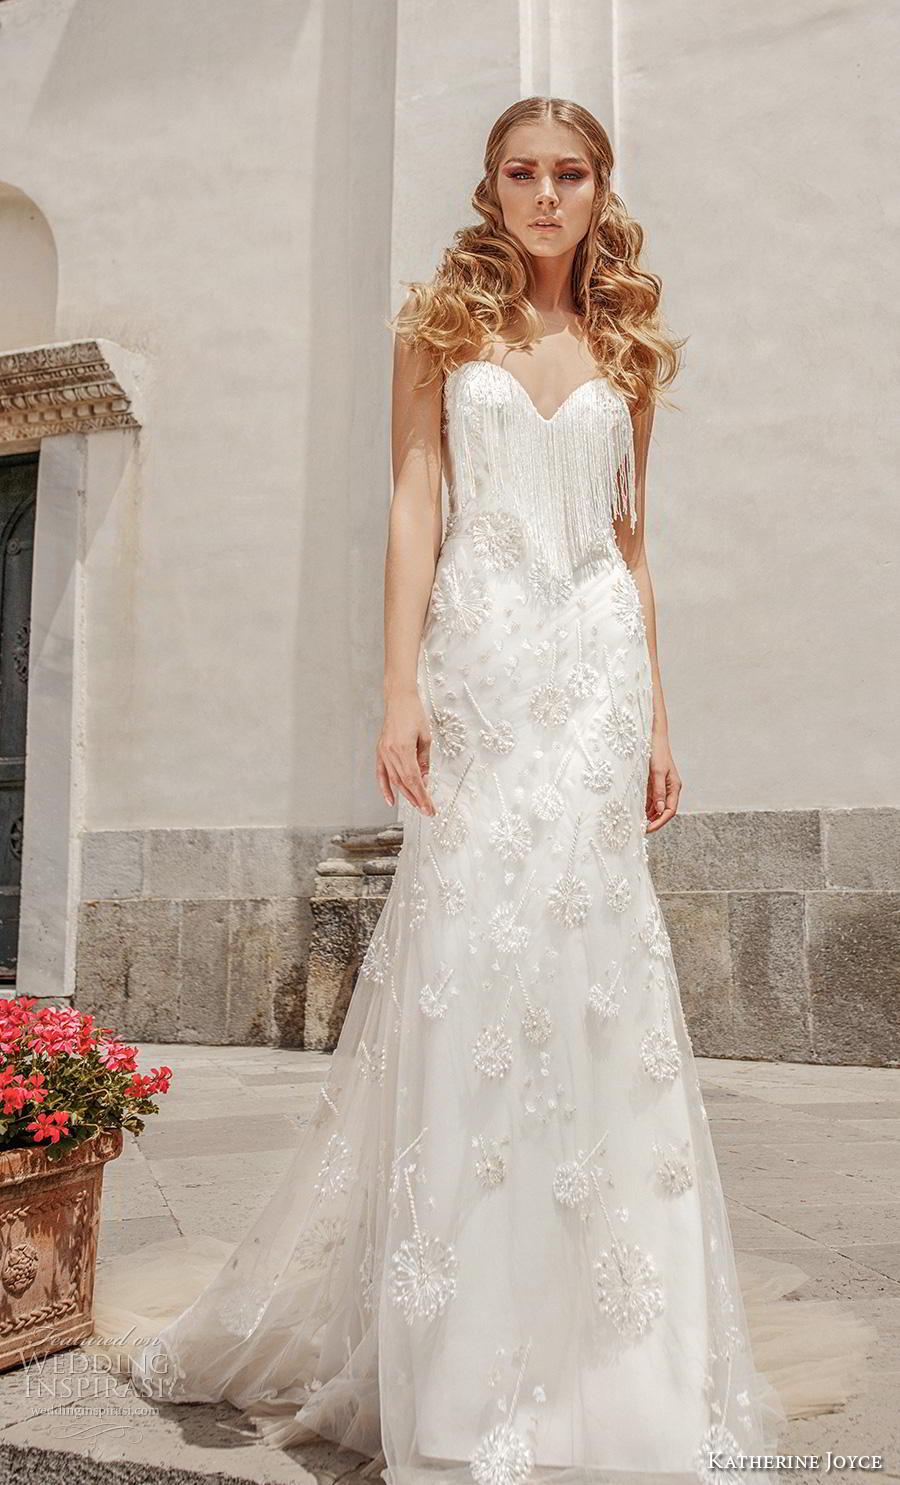 katherine joyce 2019 bridal sheer sweetheart neckline full embellishment fringes drop waist a  line wedding dress backless chapel train (10) mv